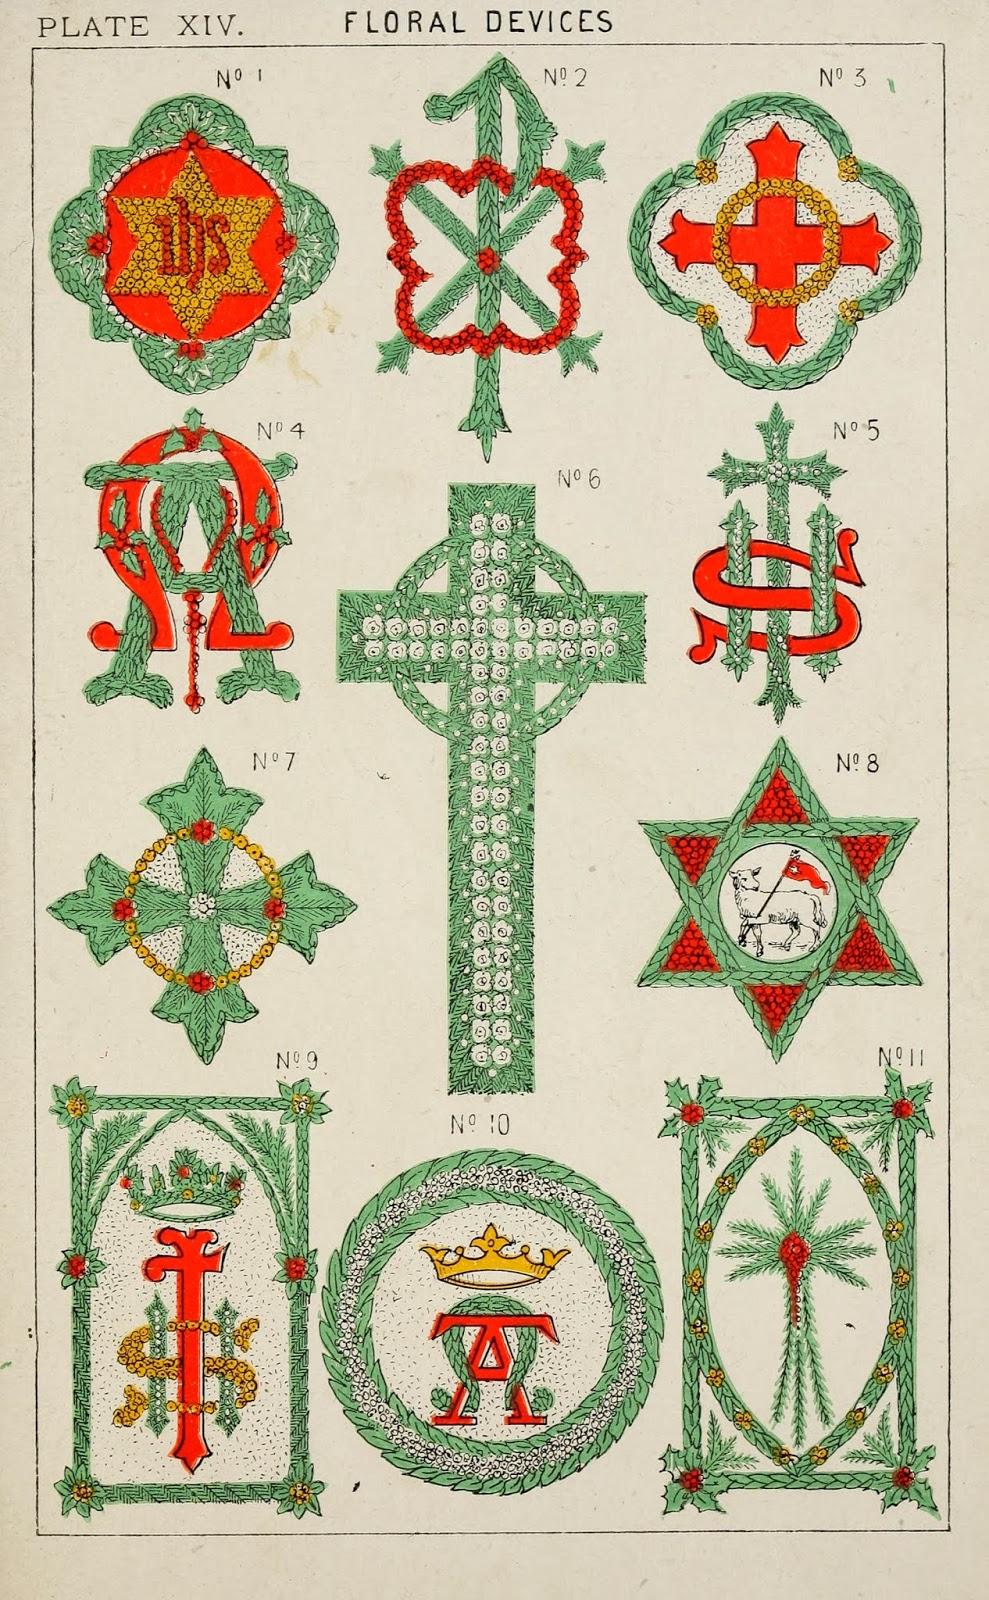 http://3.bp.blogspot.com/-o0Hx-eLaKPY/Uu9kOmYAAOI/AAAAAAAABWA/x8Lfap3k46M/s1600/Church+Decoration+1875-1.jpg